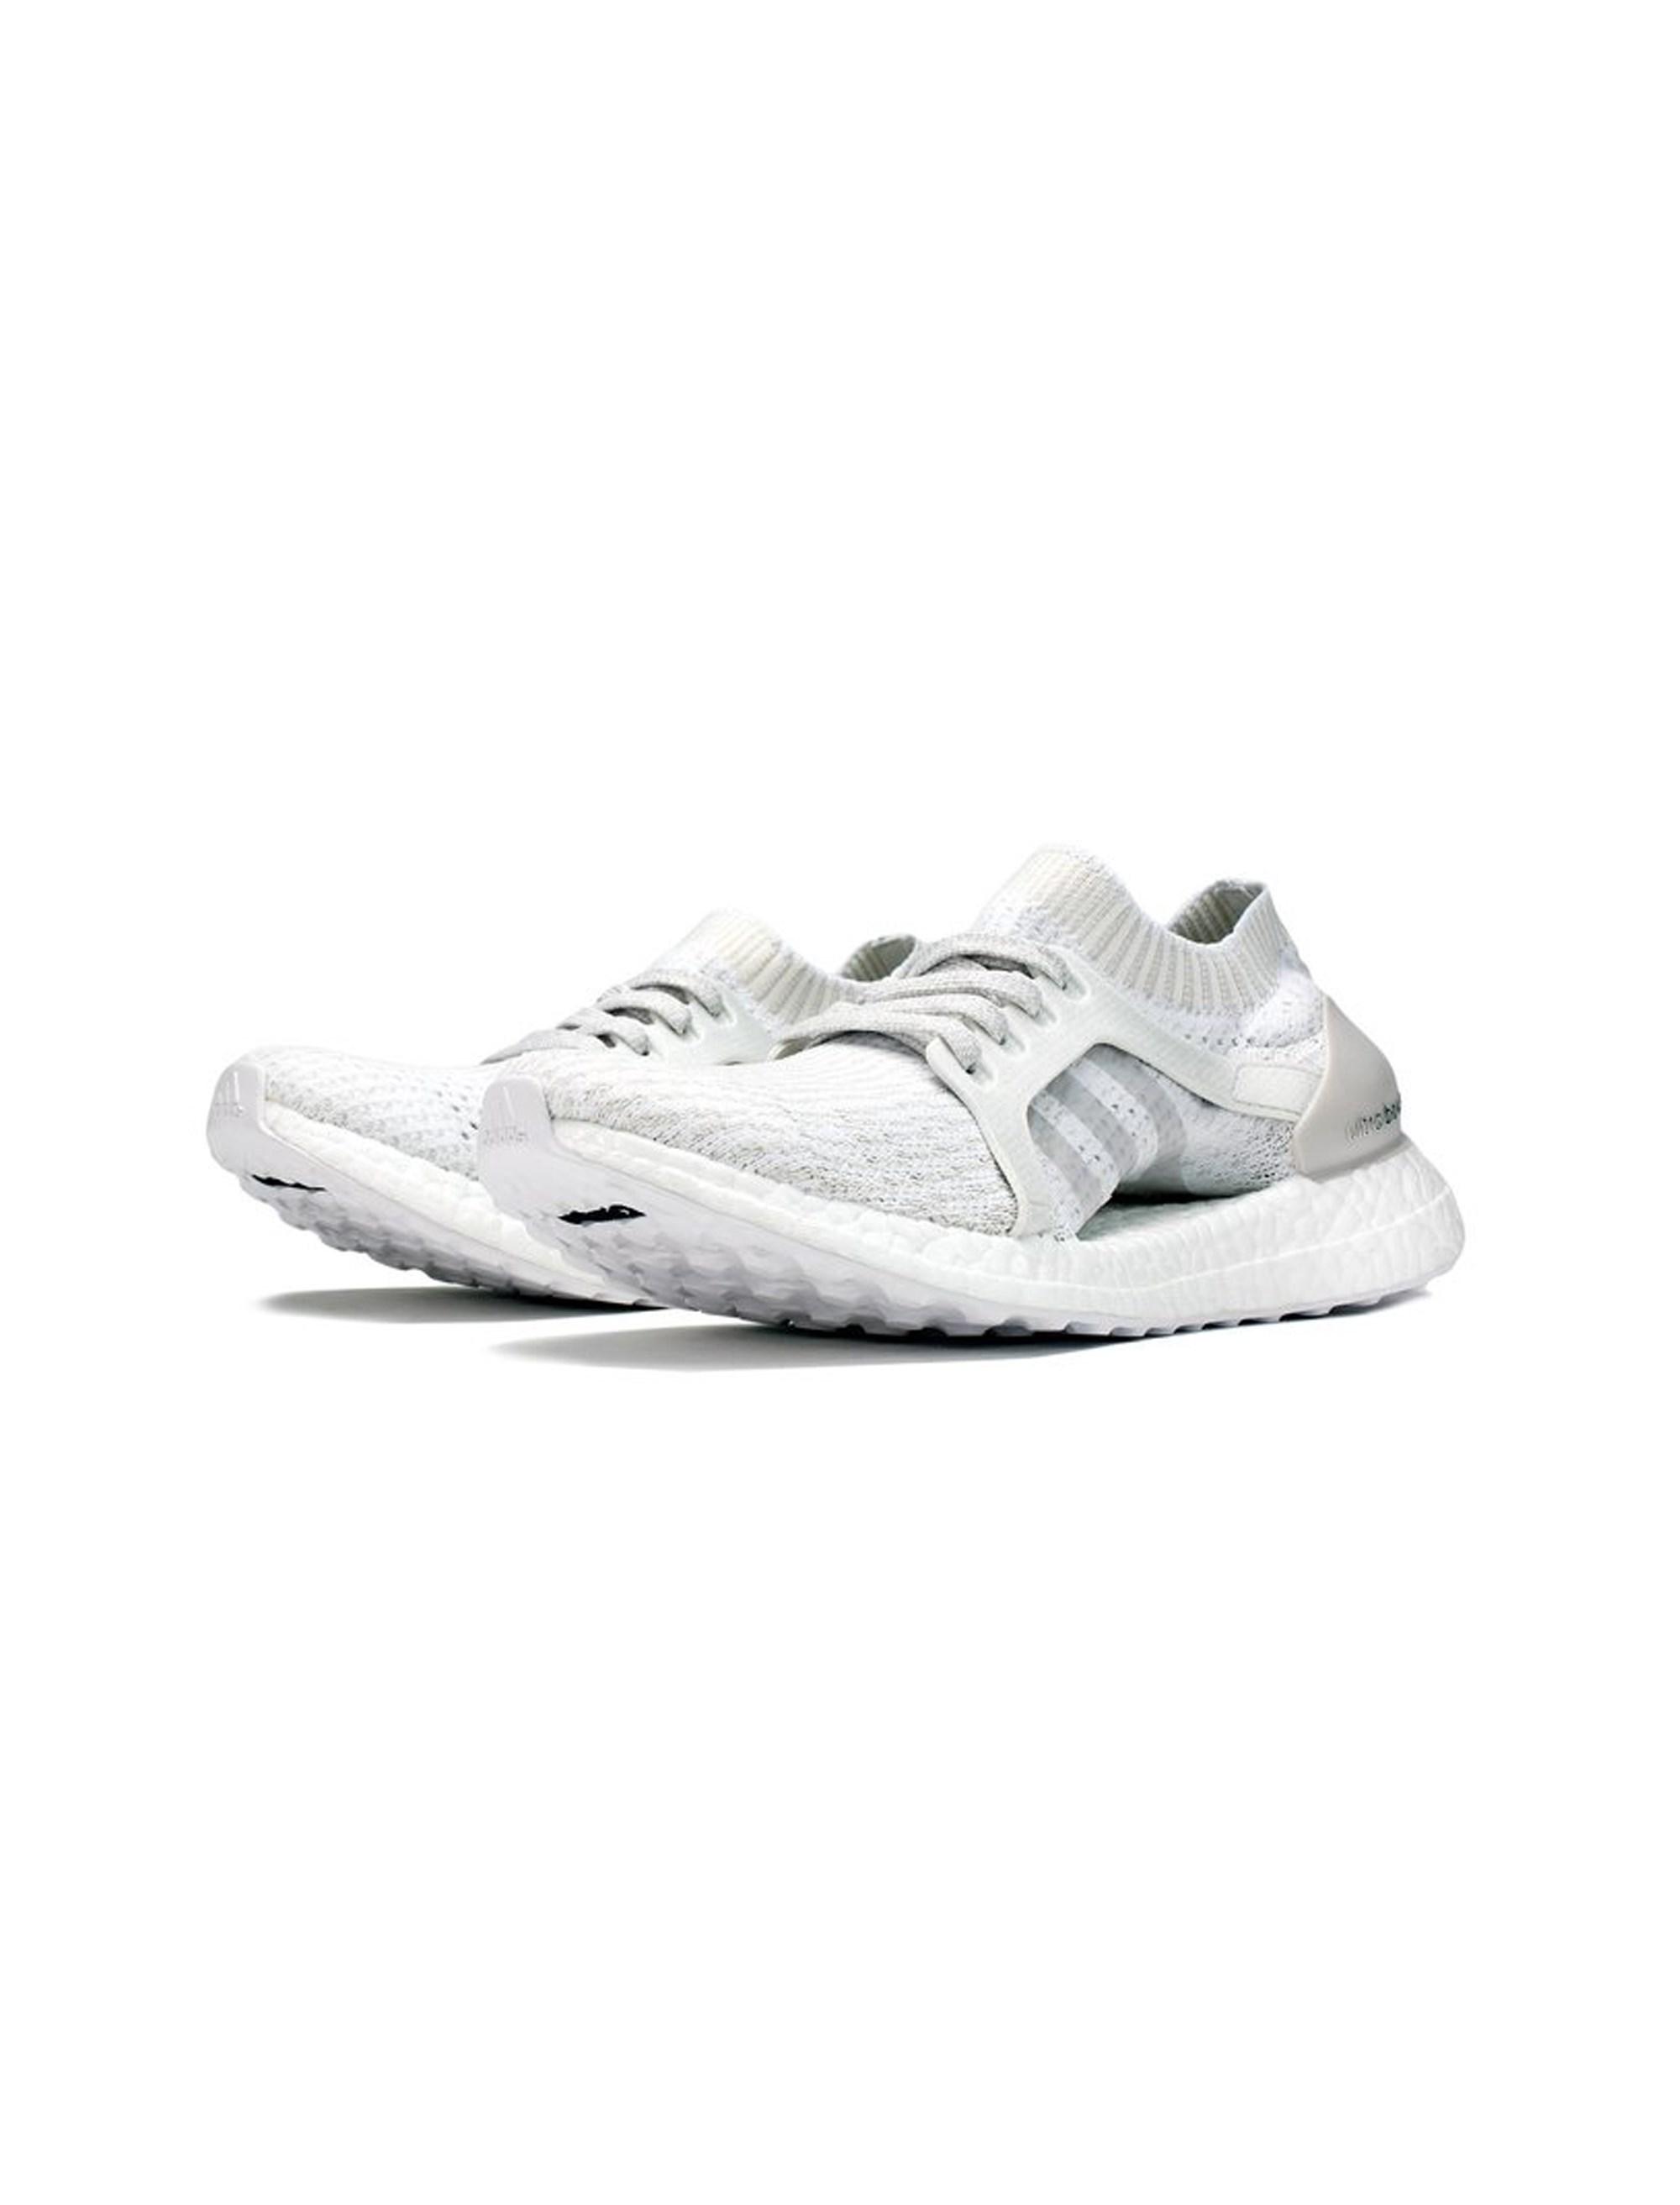 کفش مخصوص دویدن زنانه آدیداس مدل ULTRABOOST X - سفيد - 3